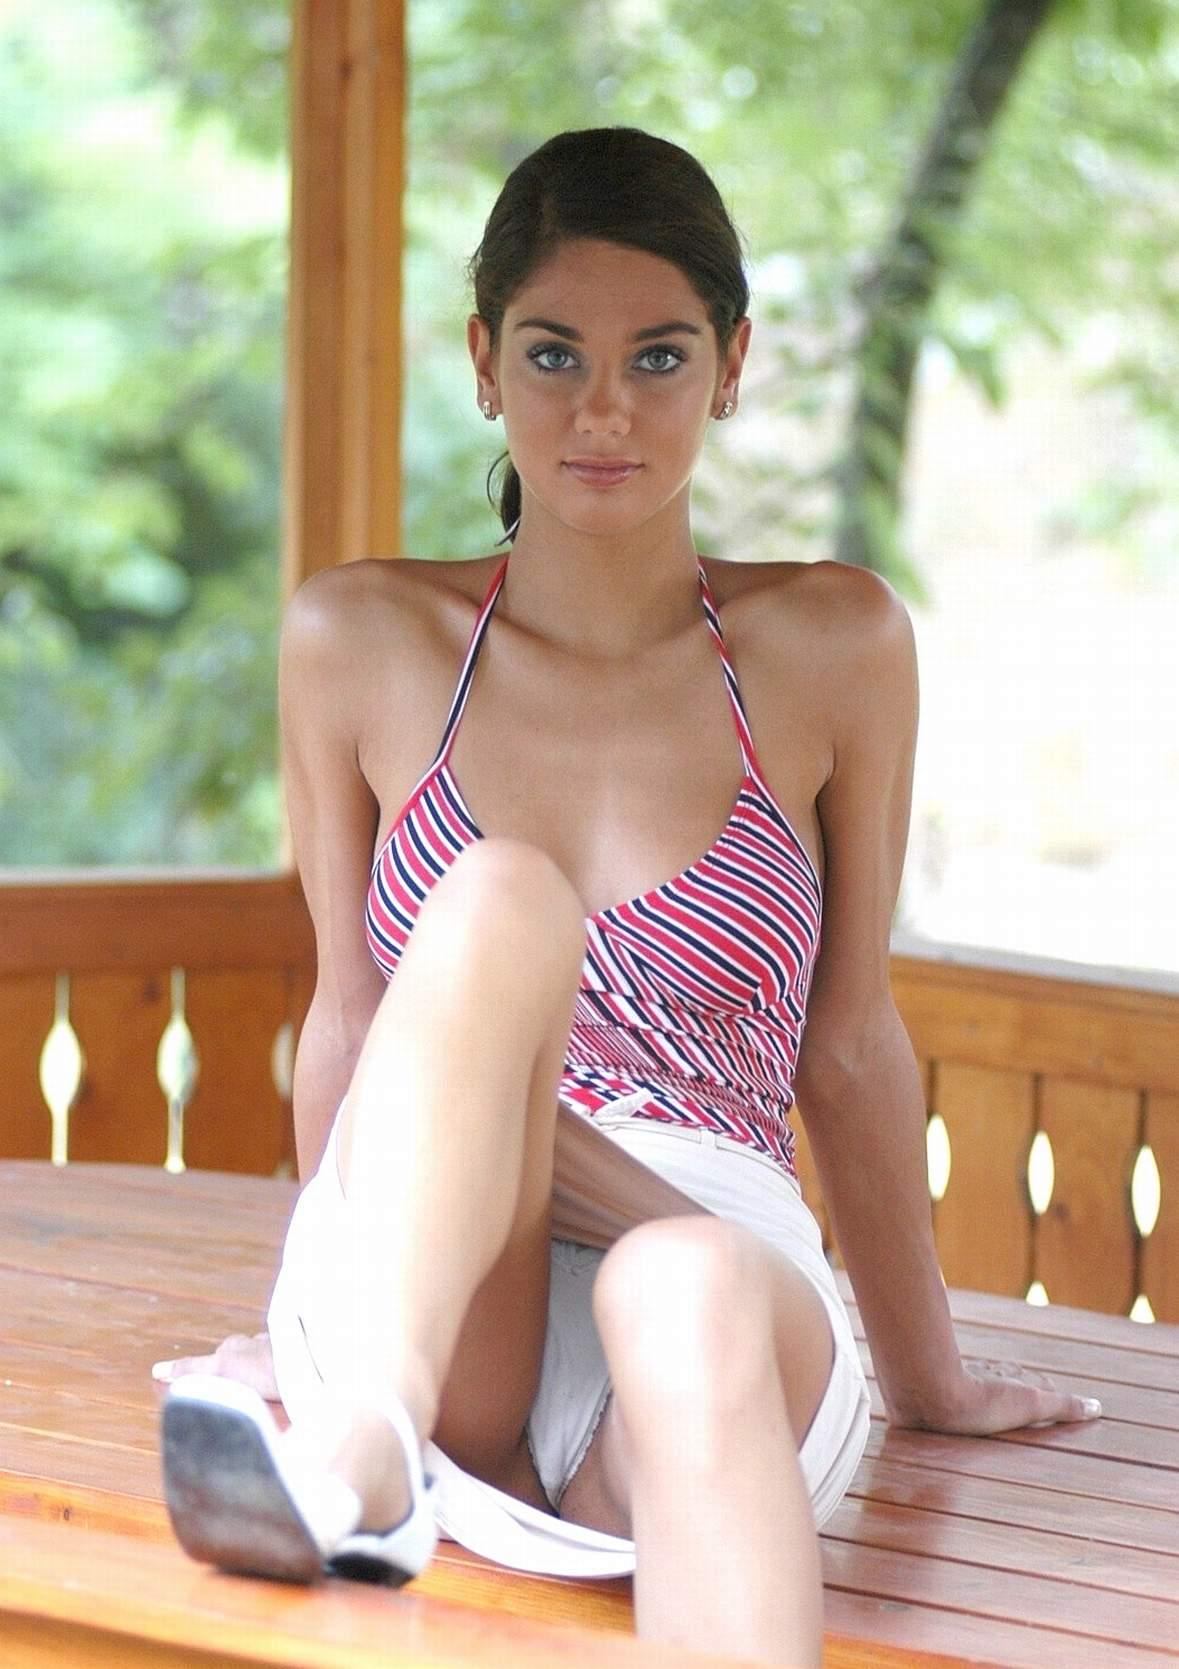 Tori Amos Upskirt With Upskirt Sitting Voyeur-9266